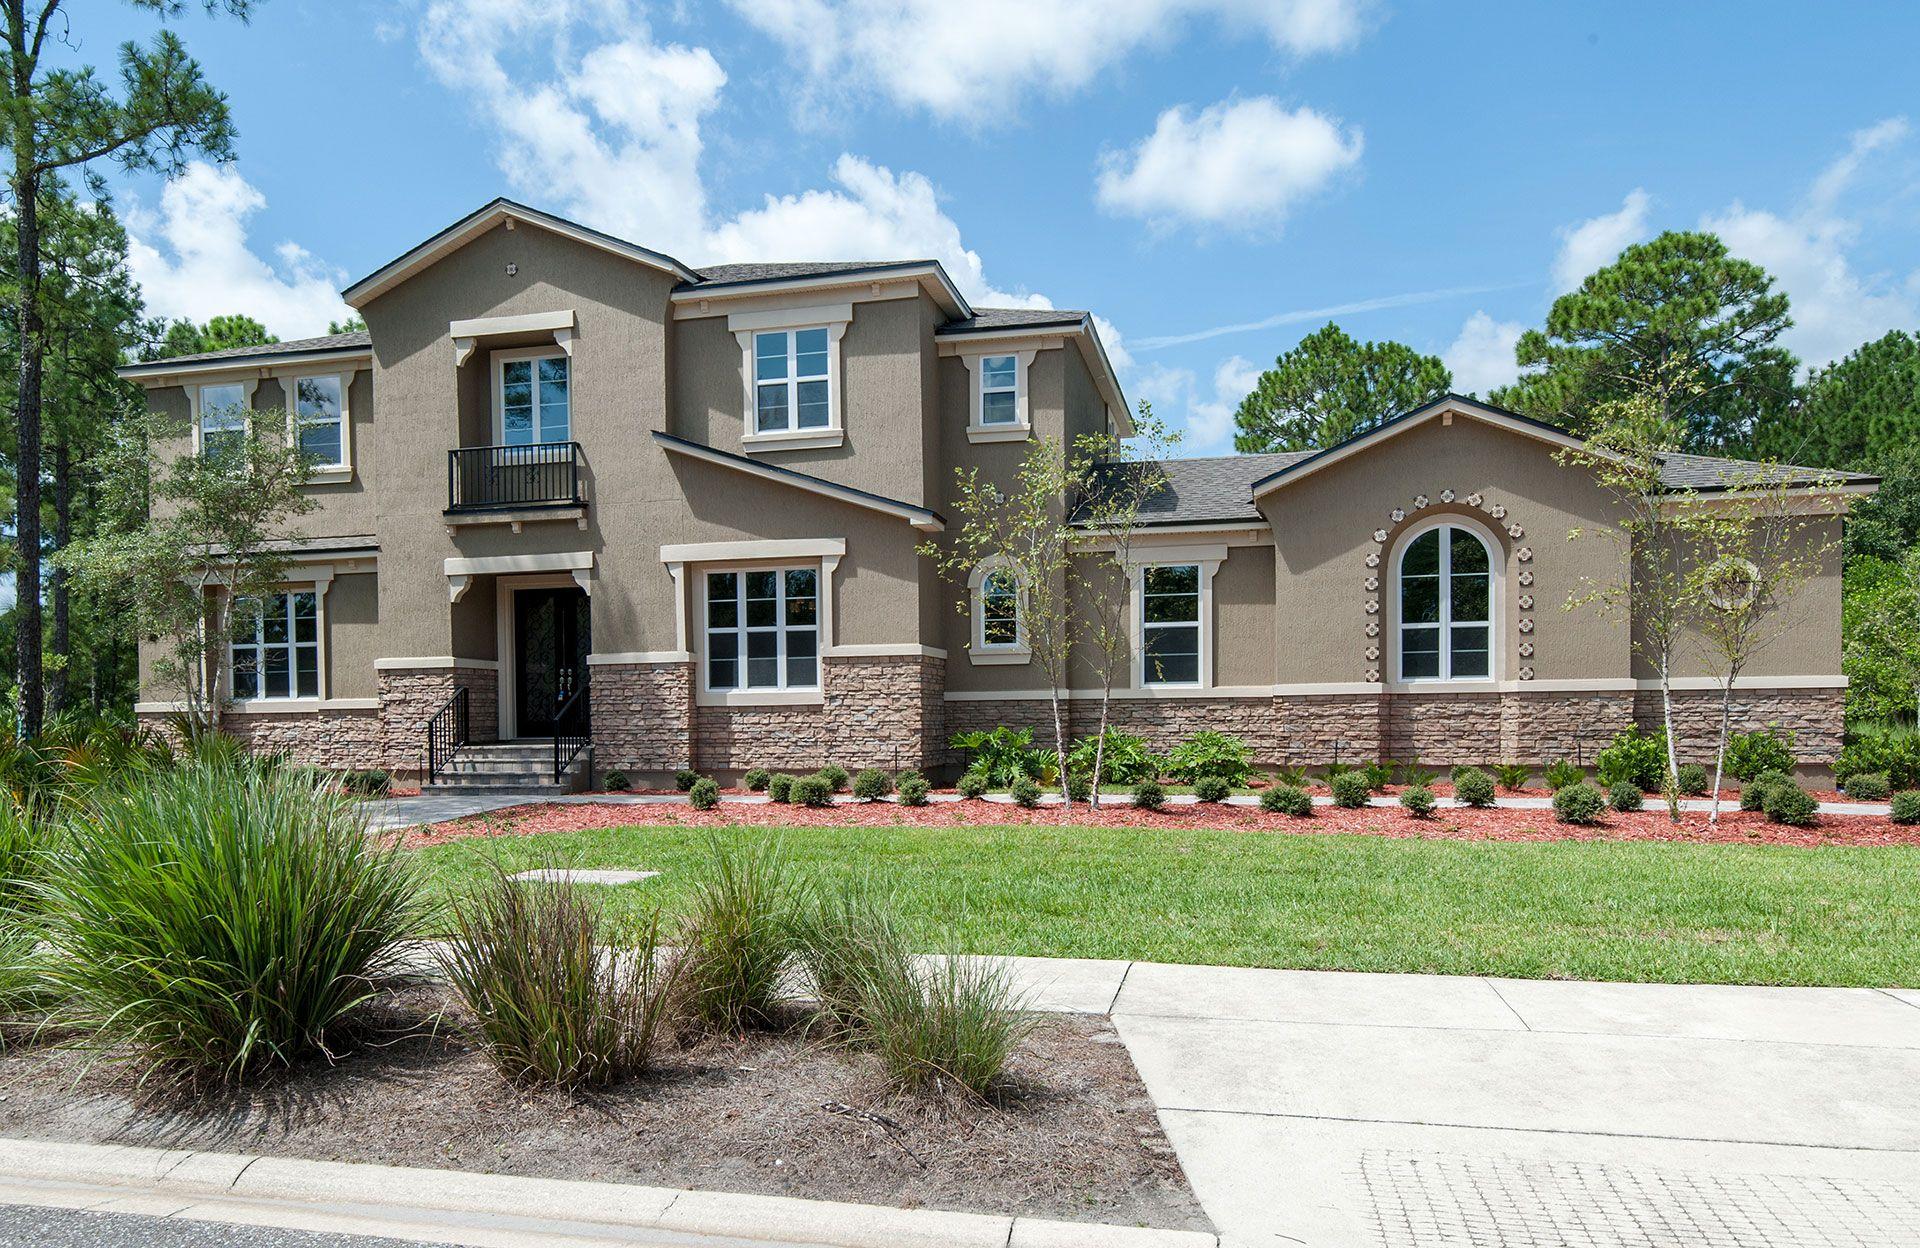 131 NORTH RIVER DRIVE, Saint Johns, FL Homes & Land - Real Estate